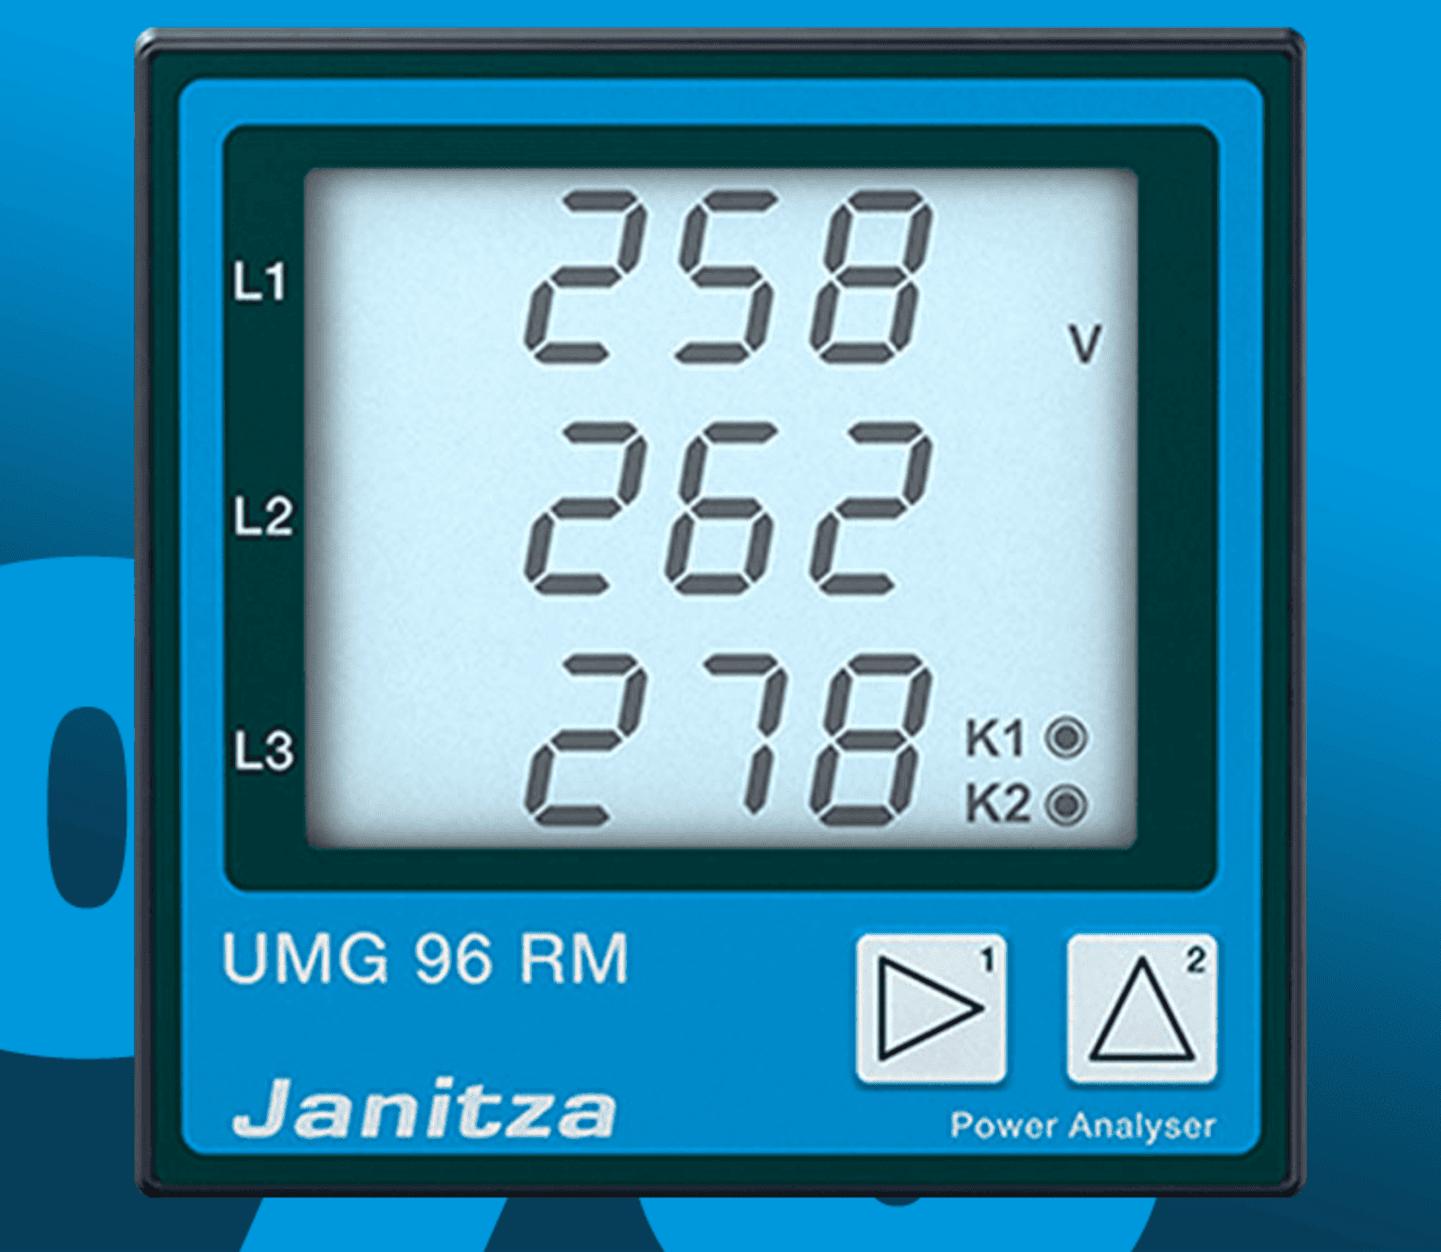 Janitza - Universalmessgerät Spannung